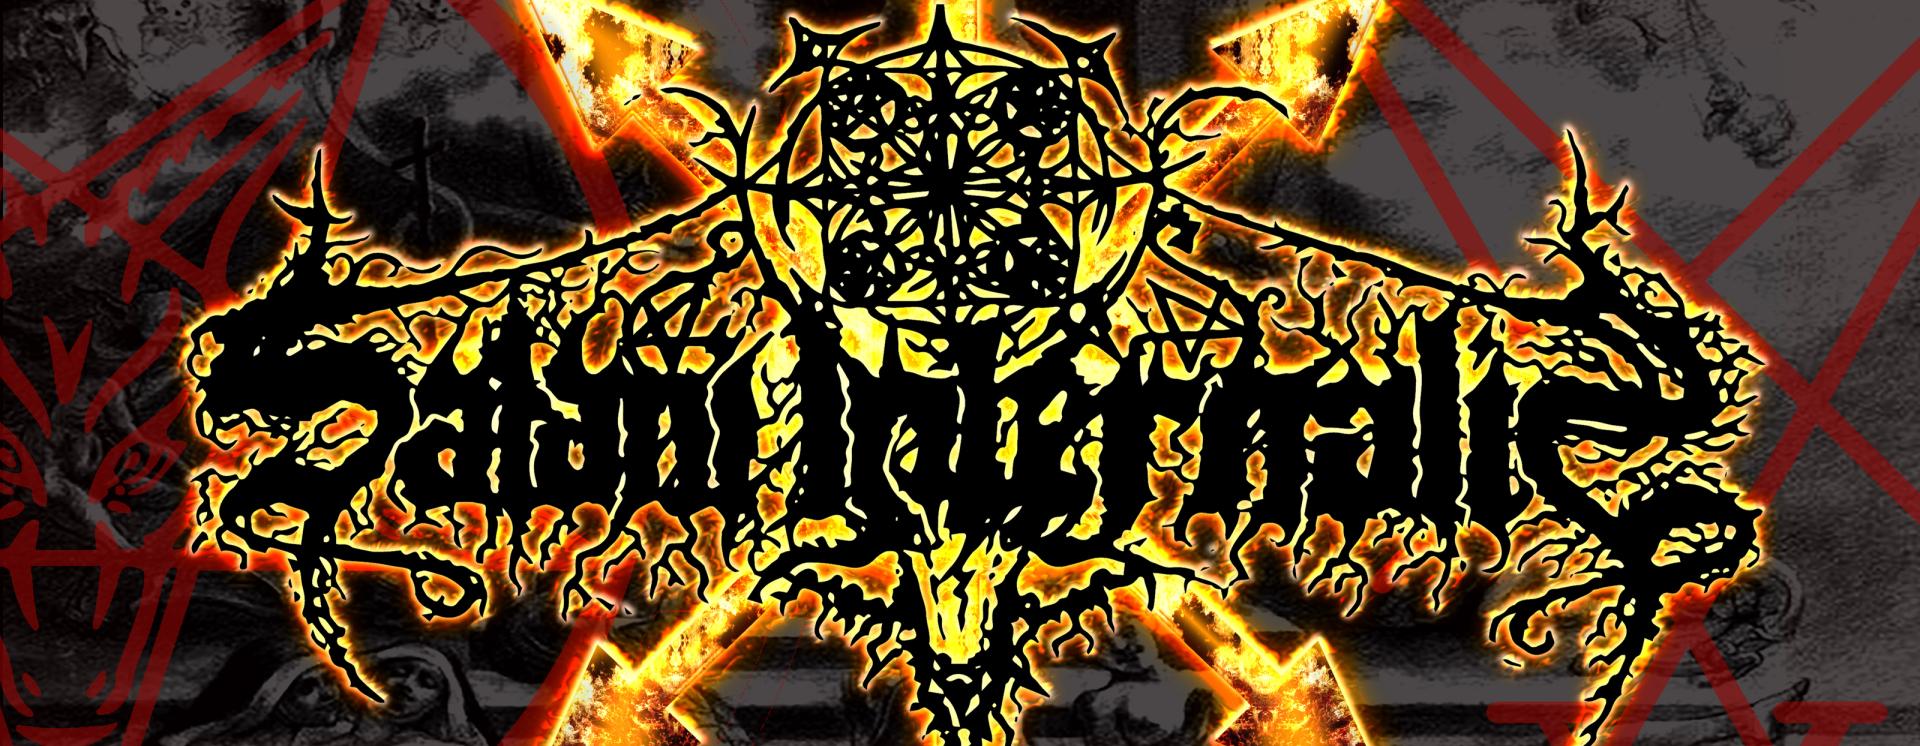 Satani baqnner new 666 revise copy